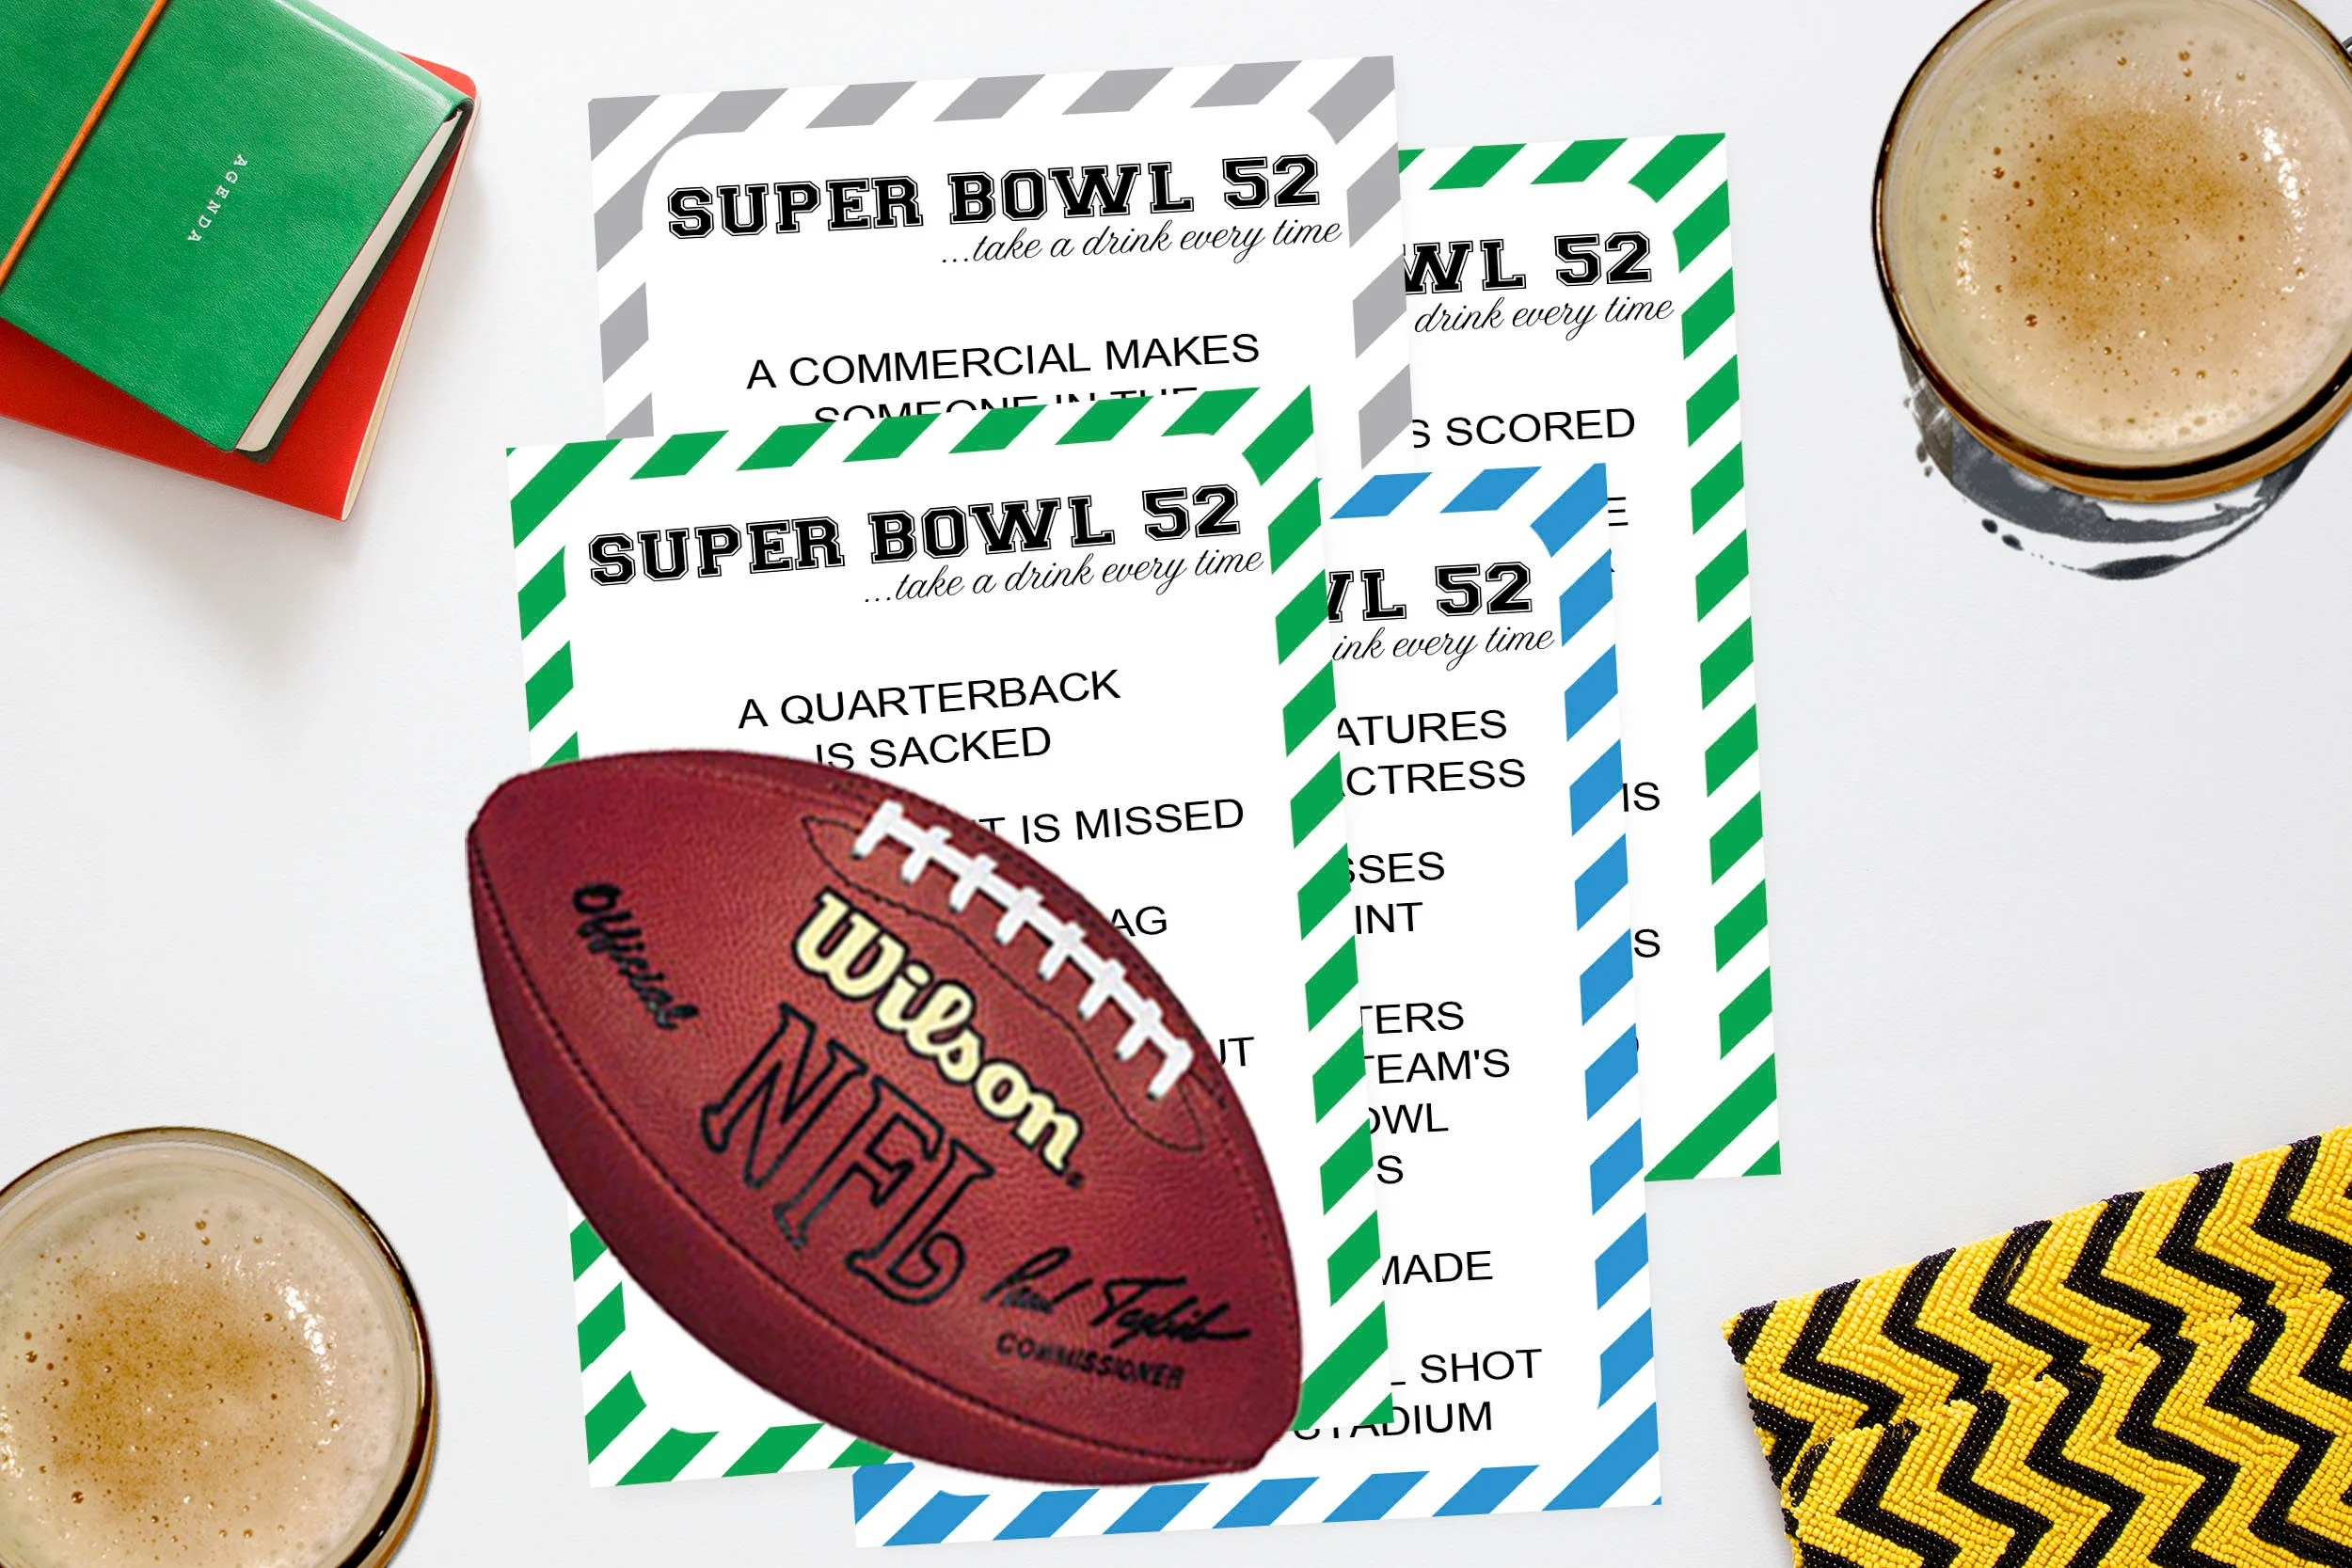 Super Bowl Drinking Game Printable Lii Superbowl 52